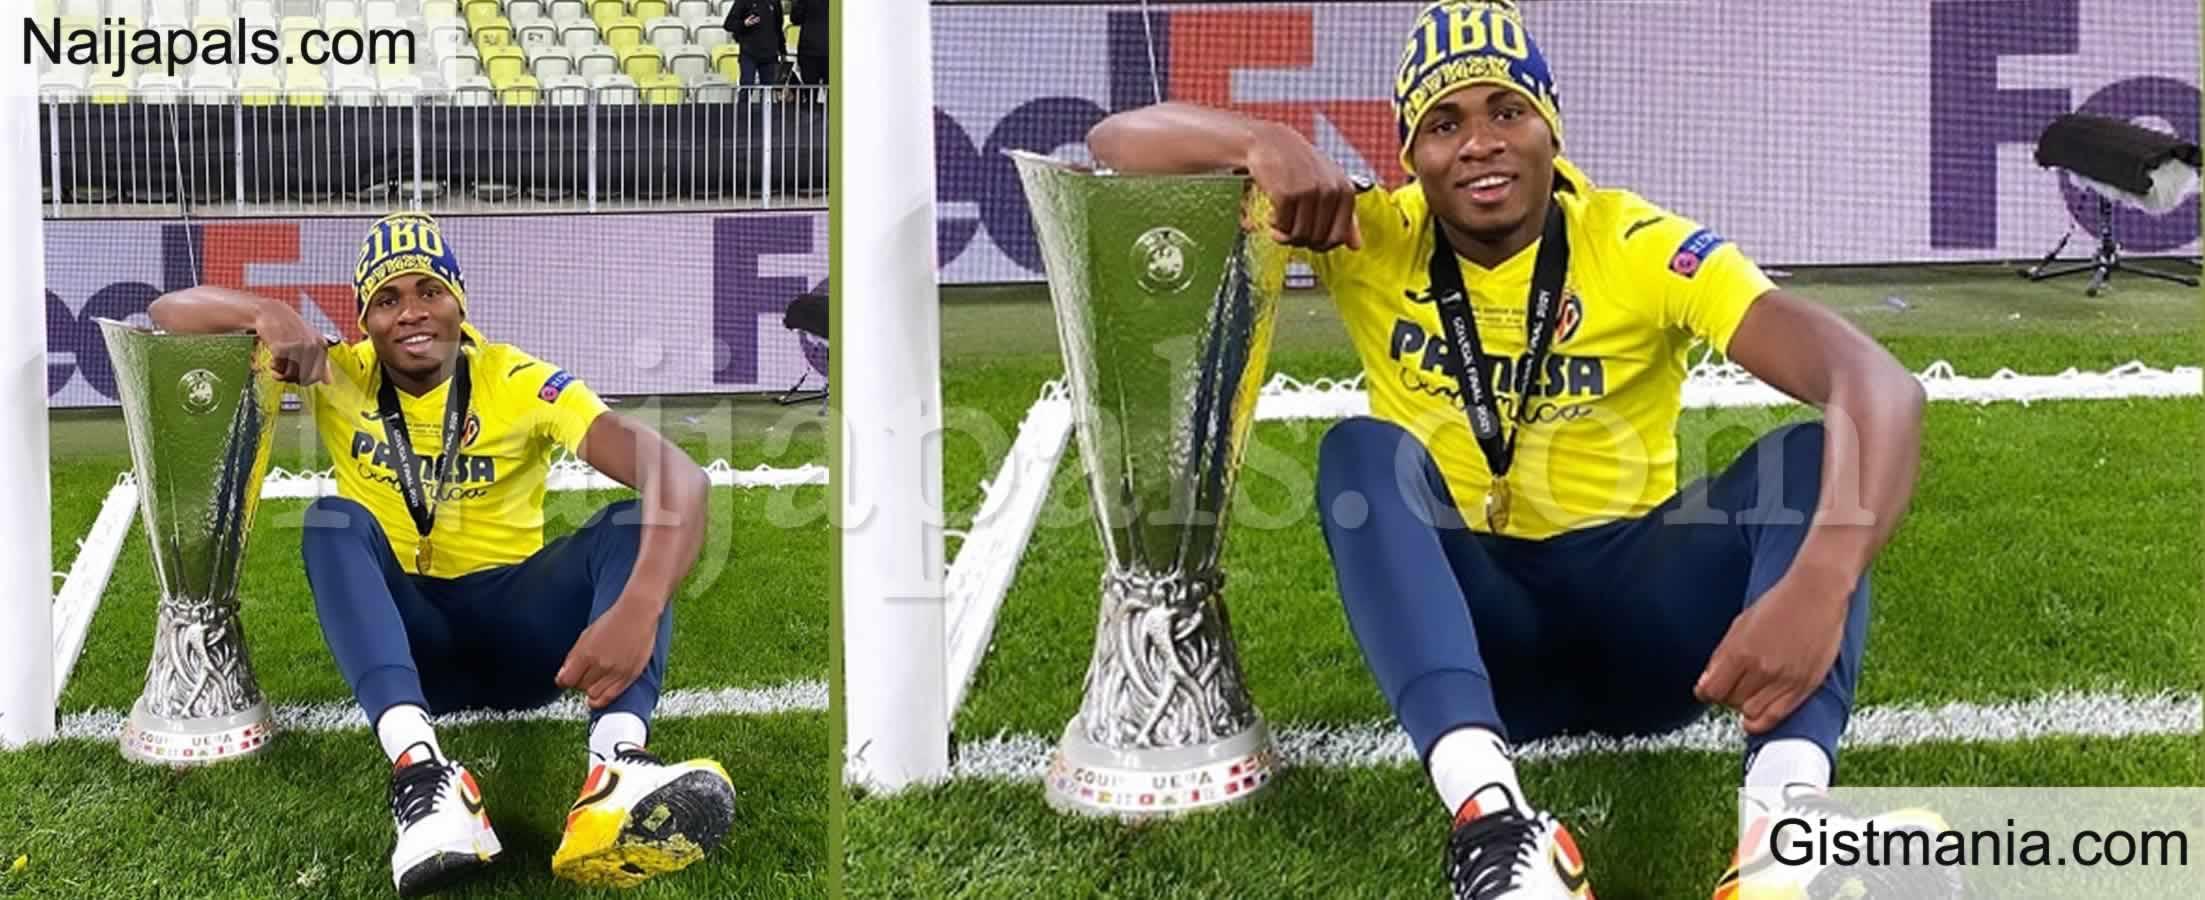 <img alt='.' class='lazyload' data-src='https://img.gistmania.com/emot/soccer.gif' /><img alt='.' class='lazyload' data-src='https://img.gistmania.com/emot/news.gif' /> <b>Nigeria International Samuel Chukwueze Sets To Join Iwobi At Everton</b>